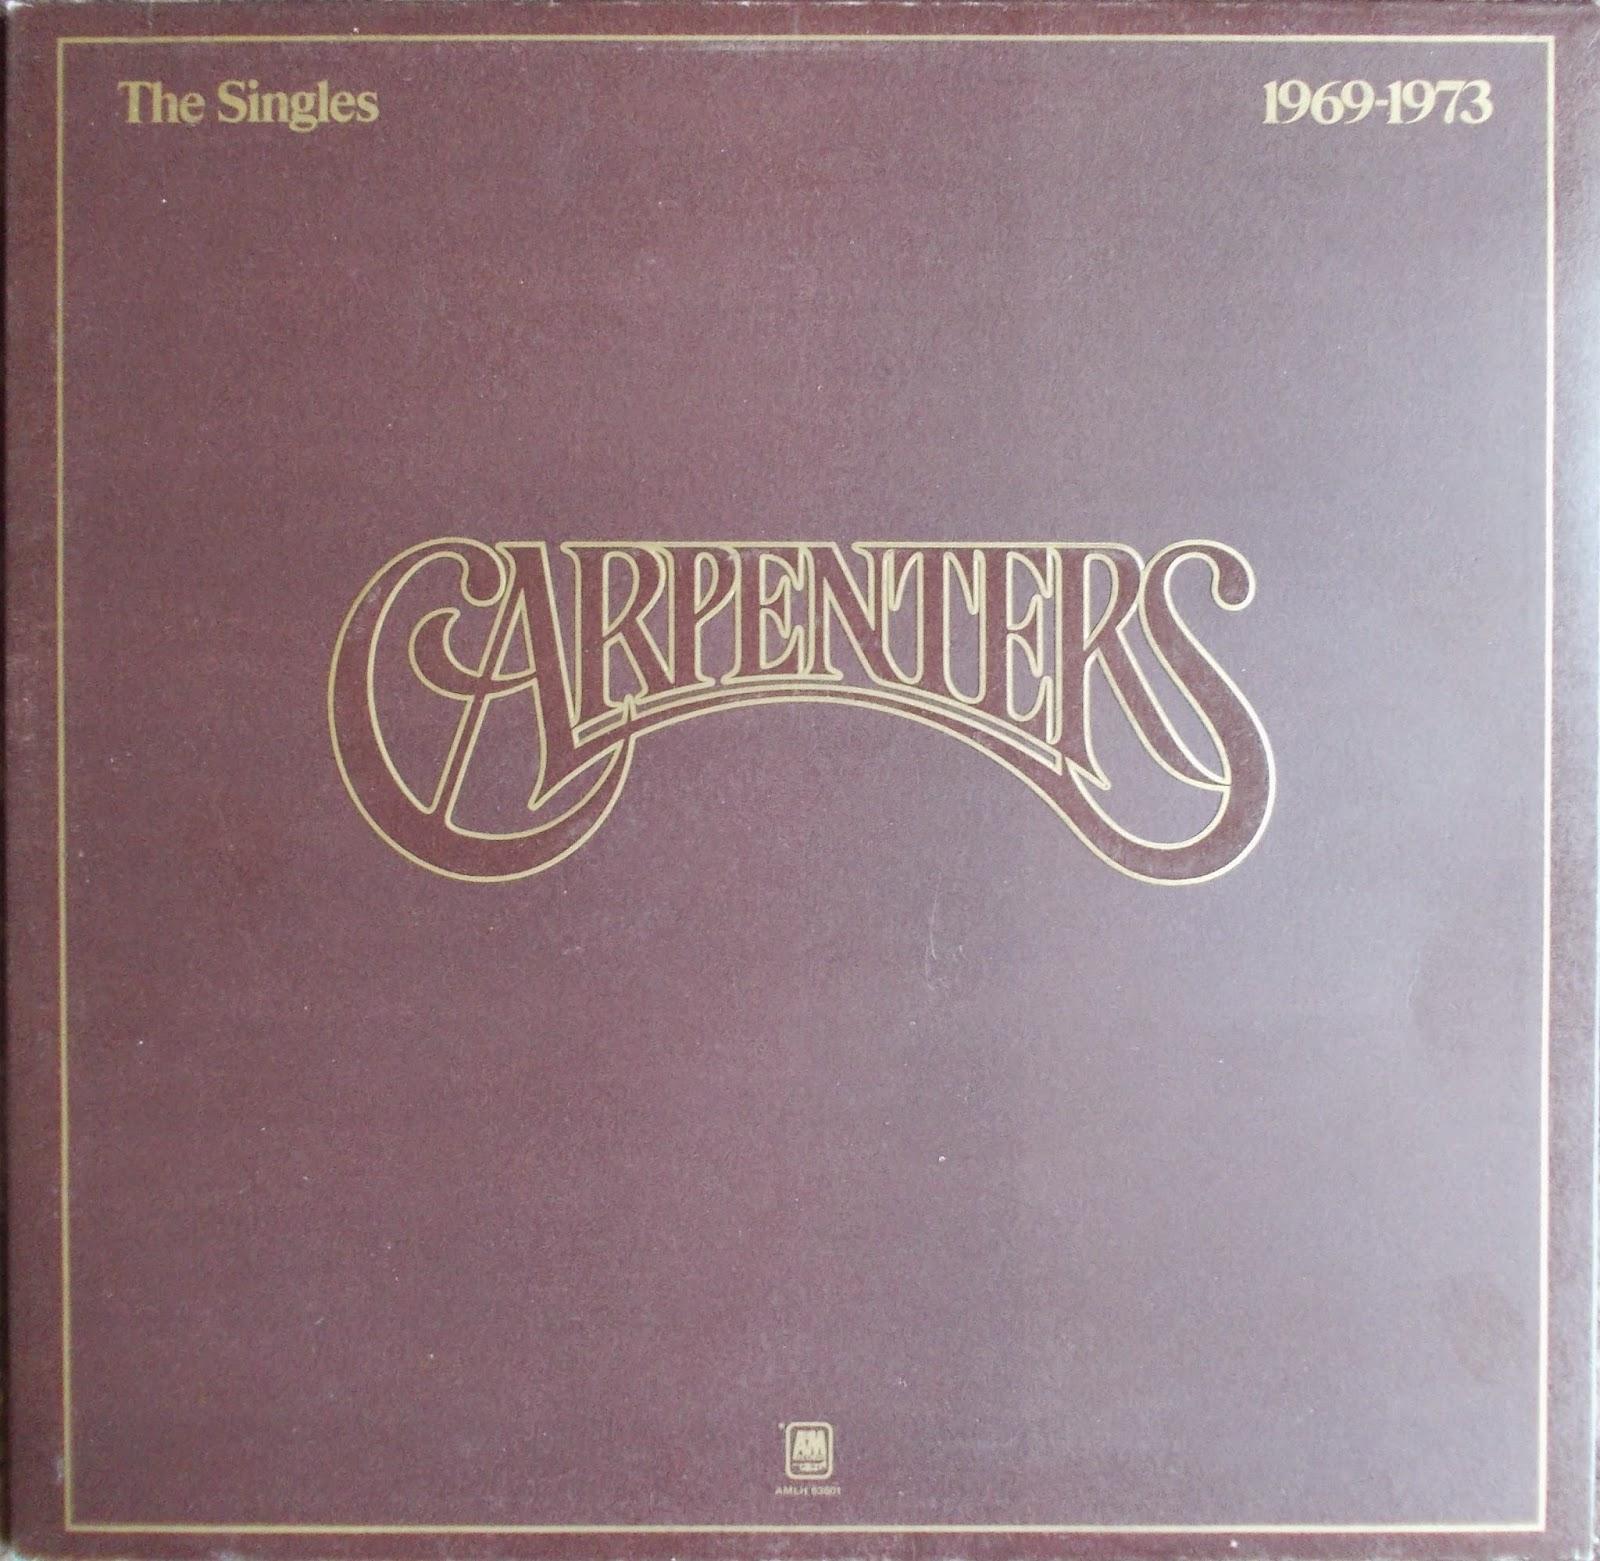 Carpenters the singles 1969 1973 Carpenters biography , Richard and Karen Carpenter